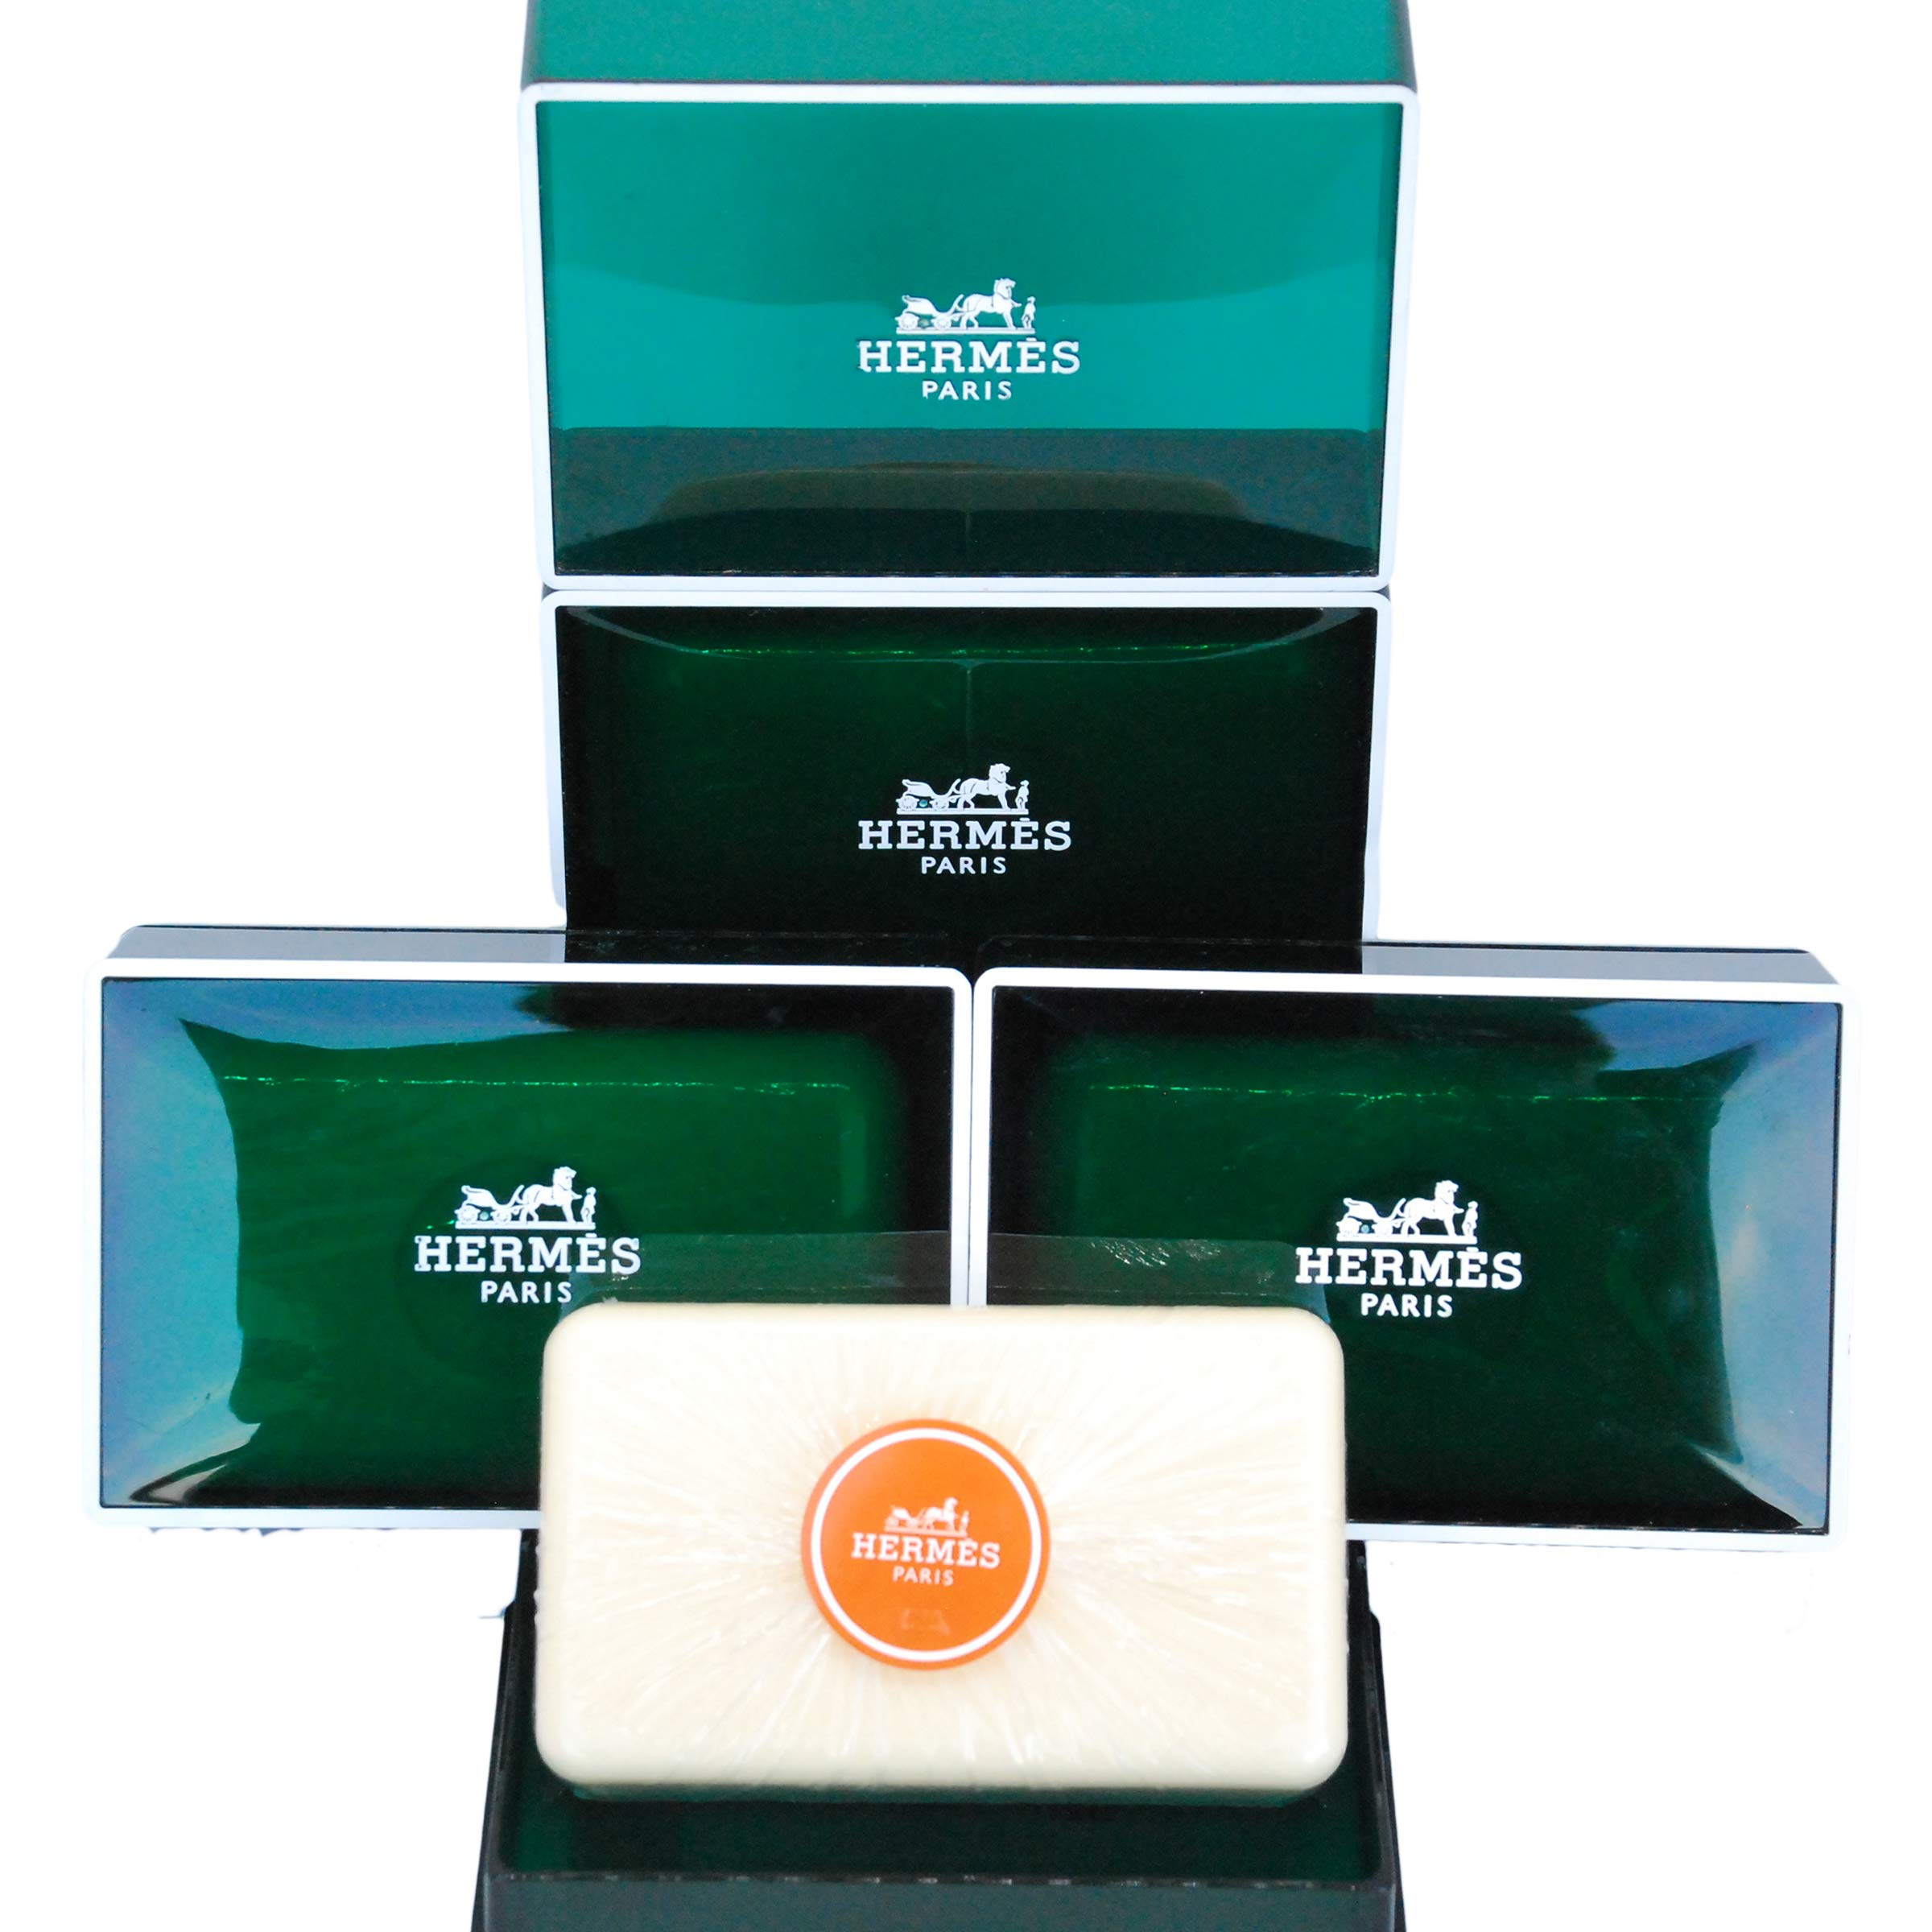 Hermès Jumbo Soaps - Eau d'Orange Verte Luxury Perfumed Gift Soaps Imported From Hermès Paris – Citrus and Mint Fragrance - 5.2 Ounces / 150 Grams - 3 Gift Boxed Perfumed Soaps / Savons Parfume in Bubble Bag – Total 15.6 Ounces / 450 Grams